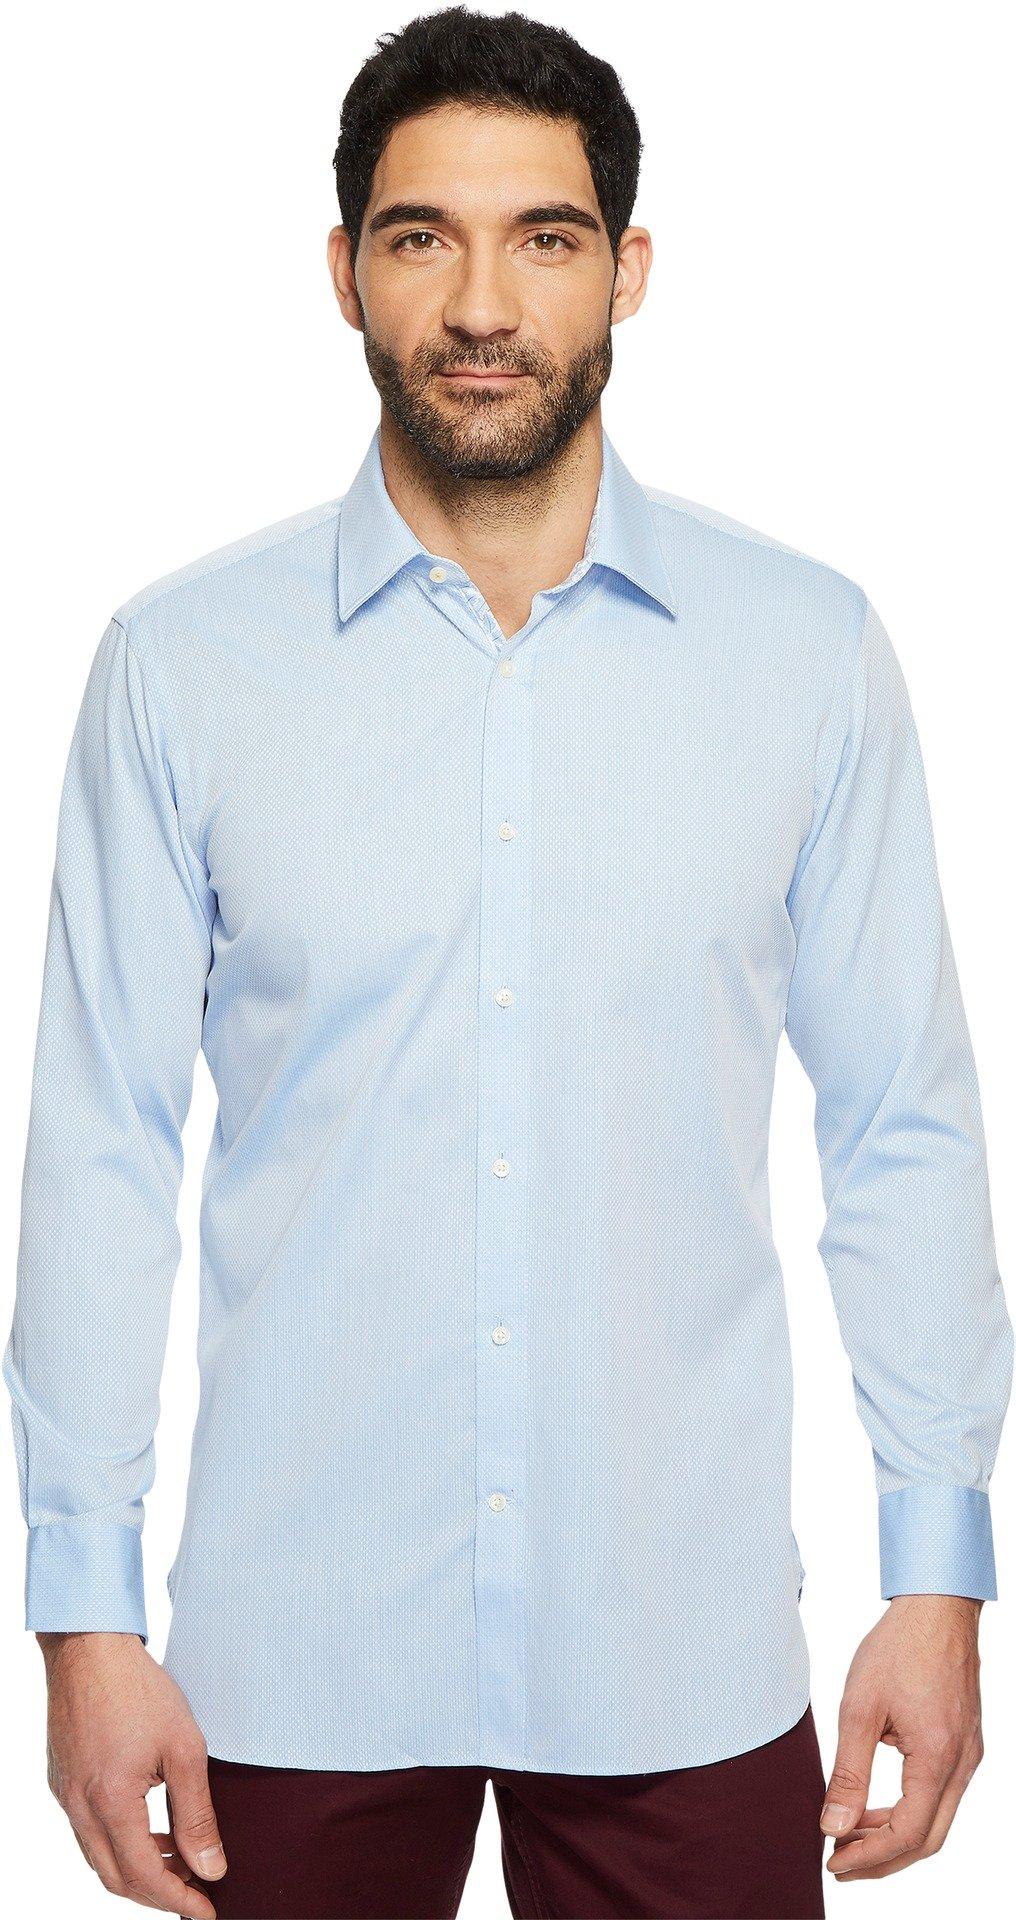 Ted Baker Men's oaker Textured Solid Dress Shirt Blue 17.5-34/35